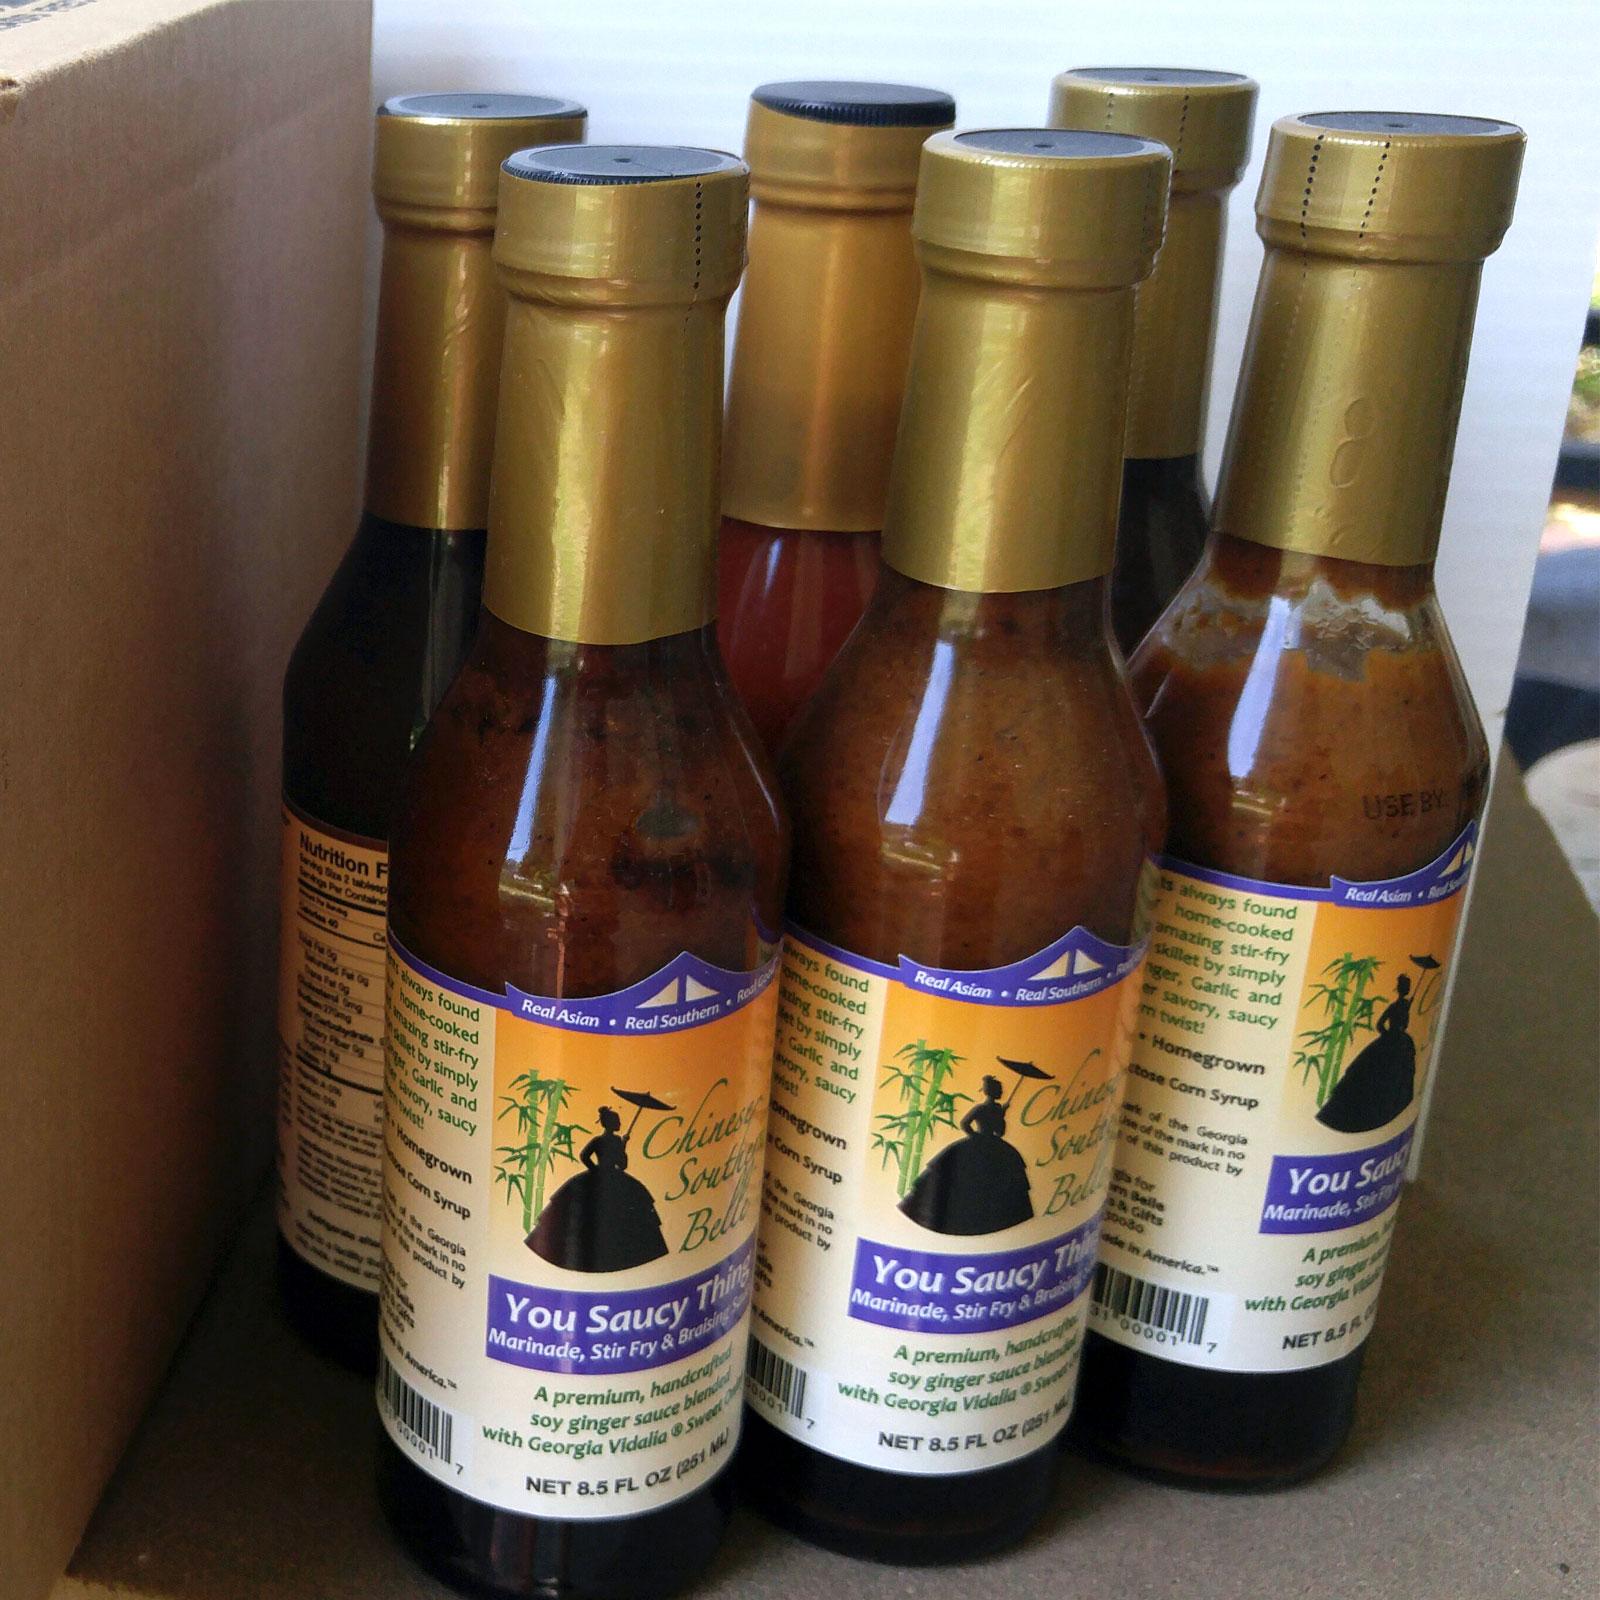 Bottle Sauce Case - 12 pk - 8 oz glass bottles (SAVE 20%!) - Chinese ...